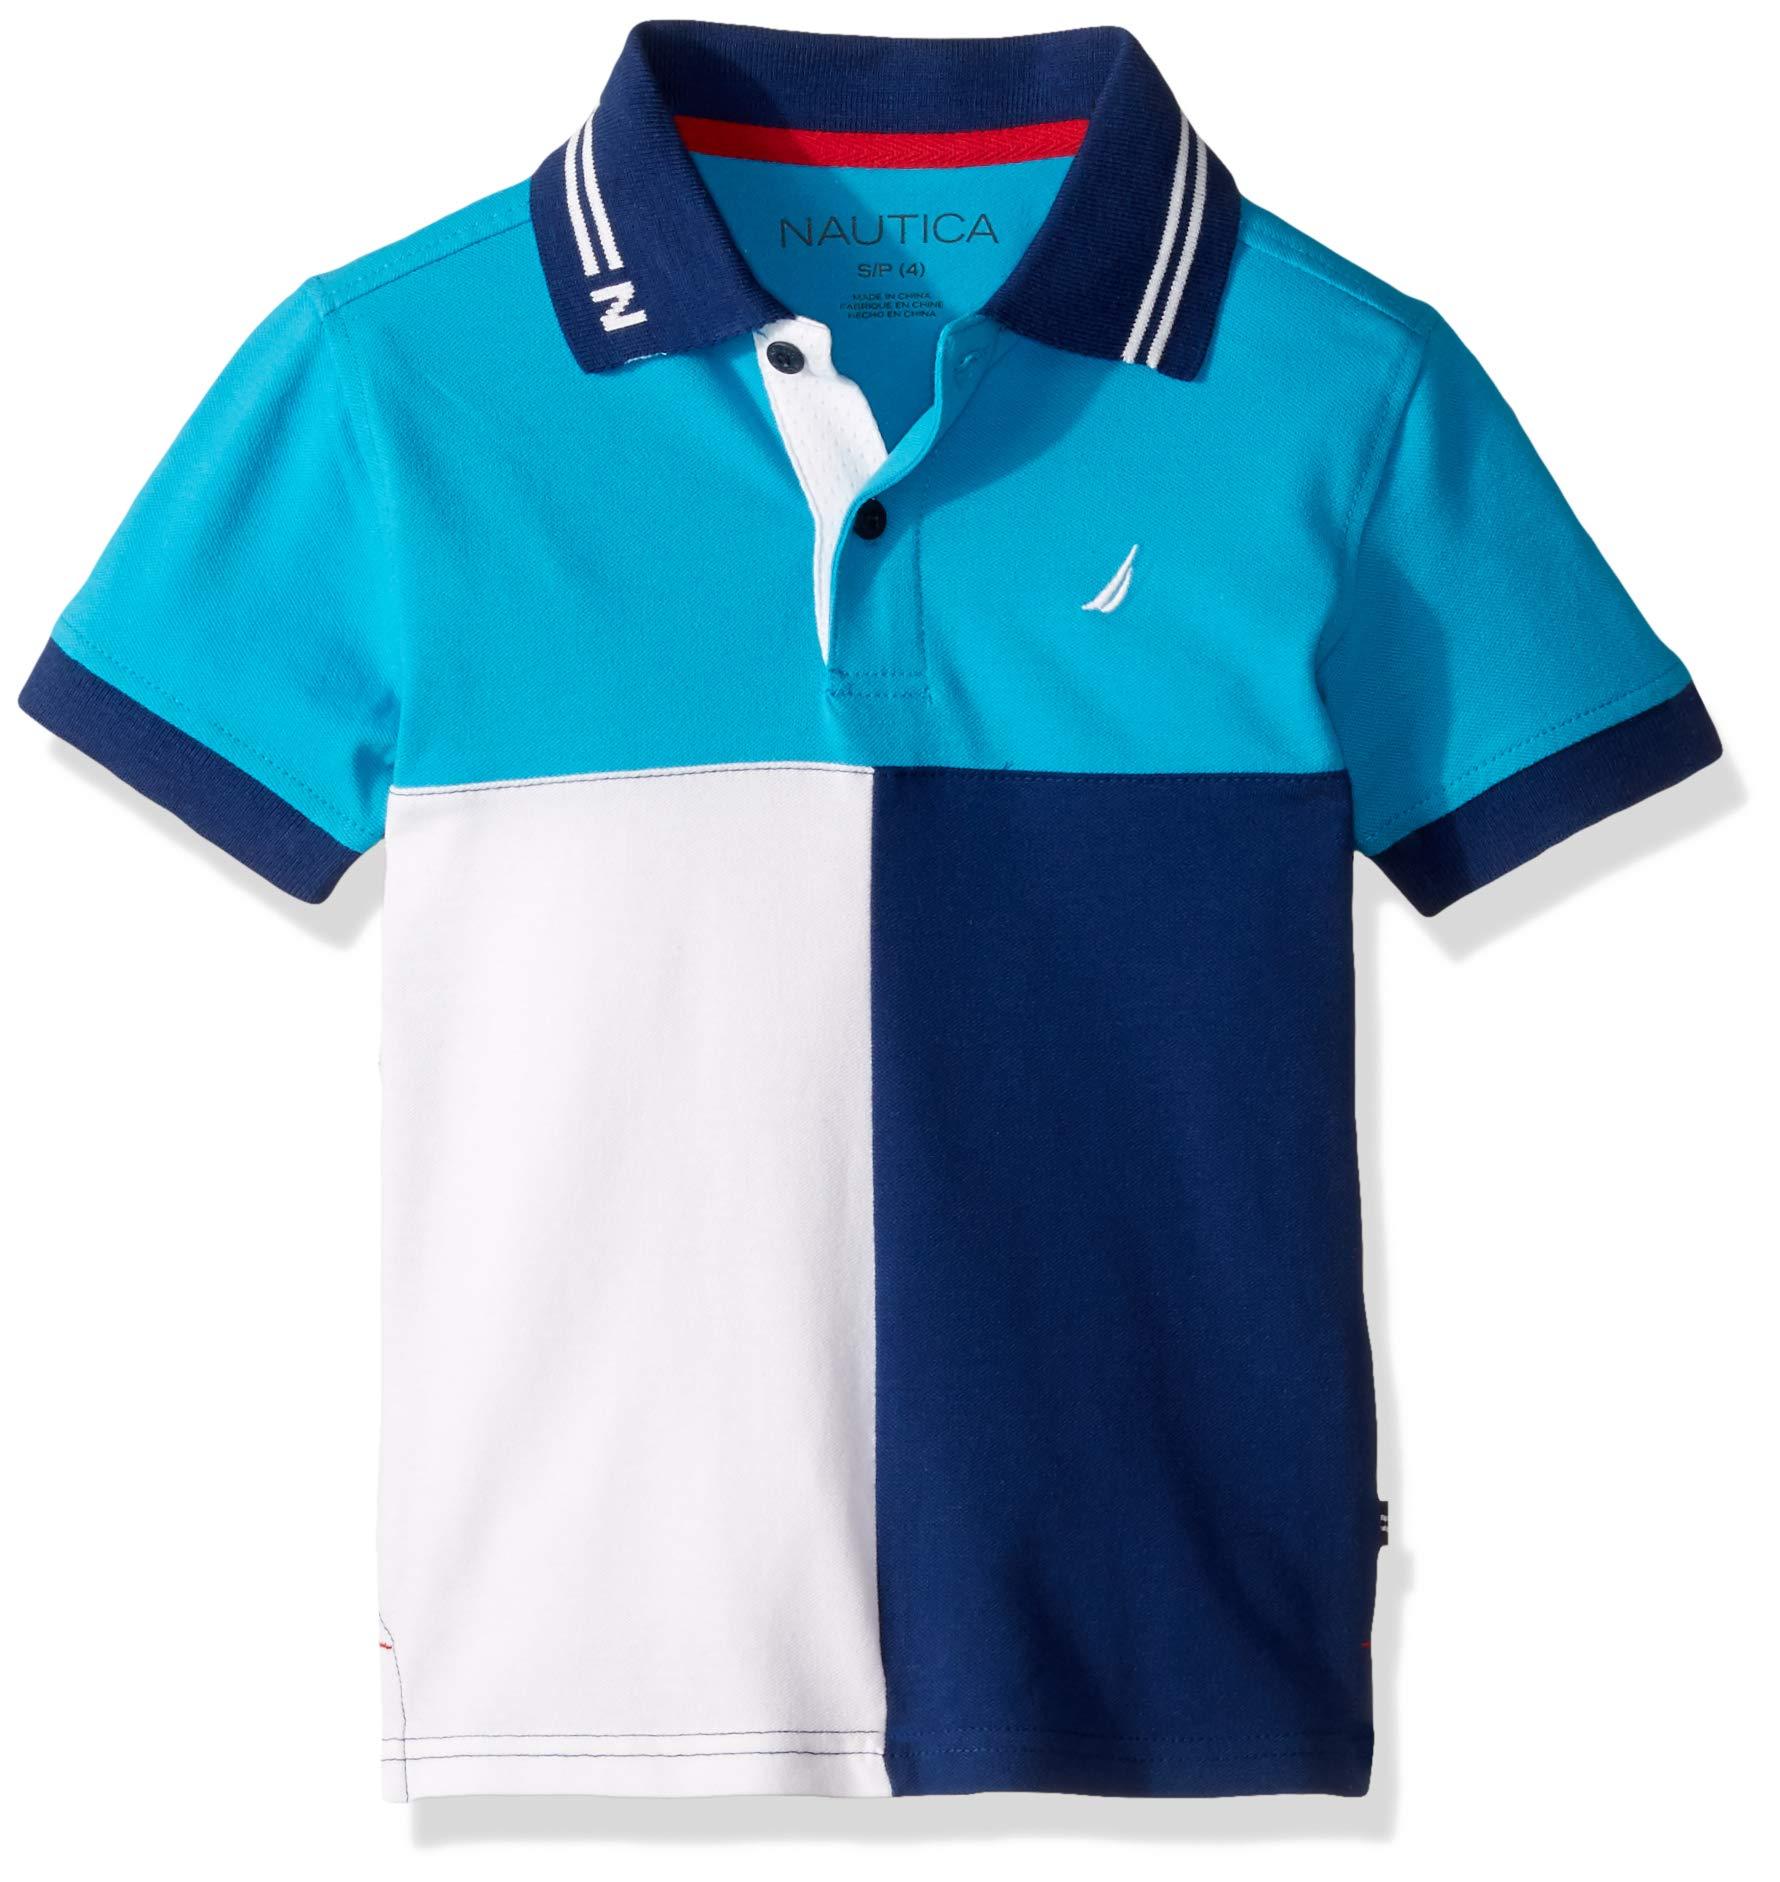 Nautica Big Boys' Short Sleeve Heritage Polo Shirt, Captain Ocean, Large (14/16)